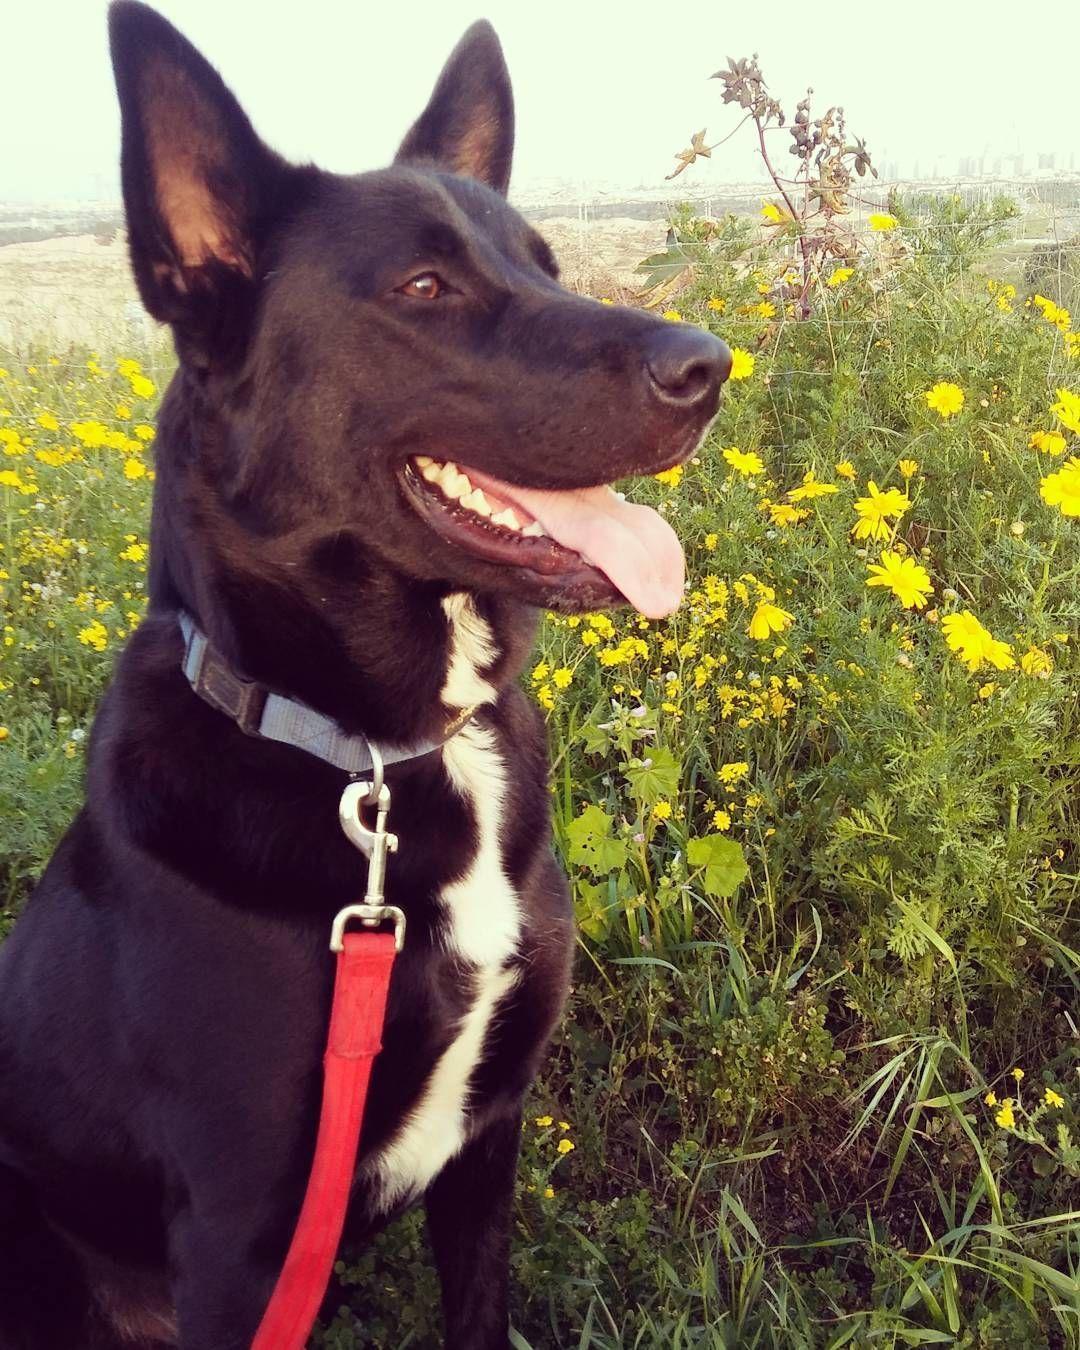 #smile# me#dog #dogsofinstagram #dogs#puppy #gym #fitness #love #beautiful #life #lifestyle #fun #fu...